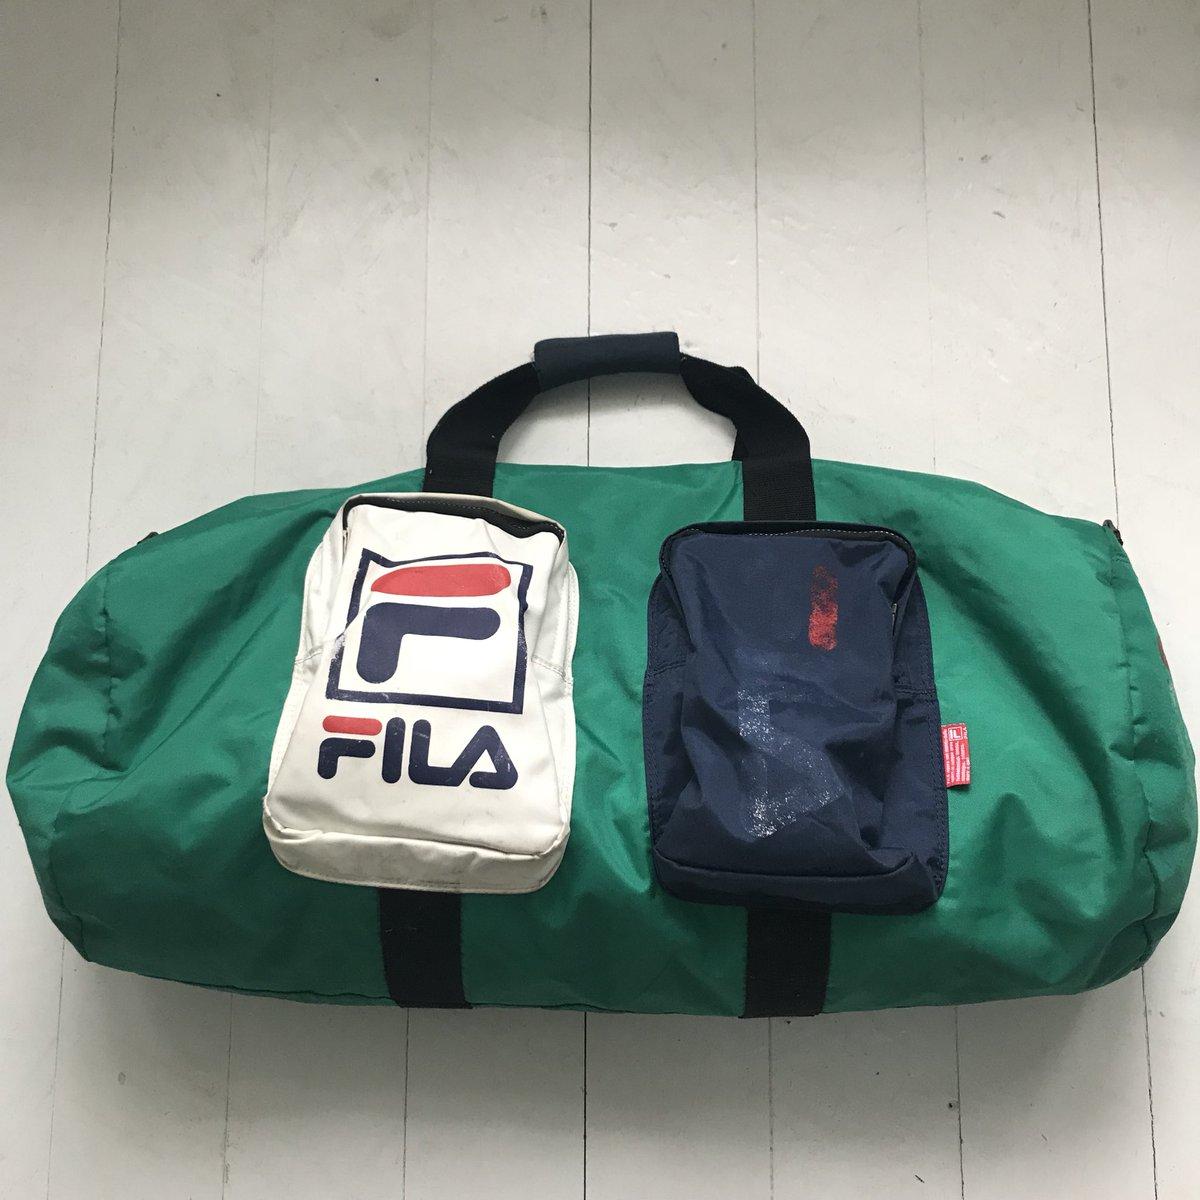 fila bags 2018